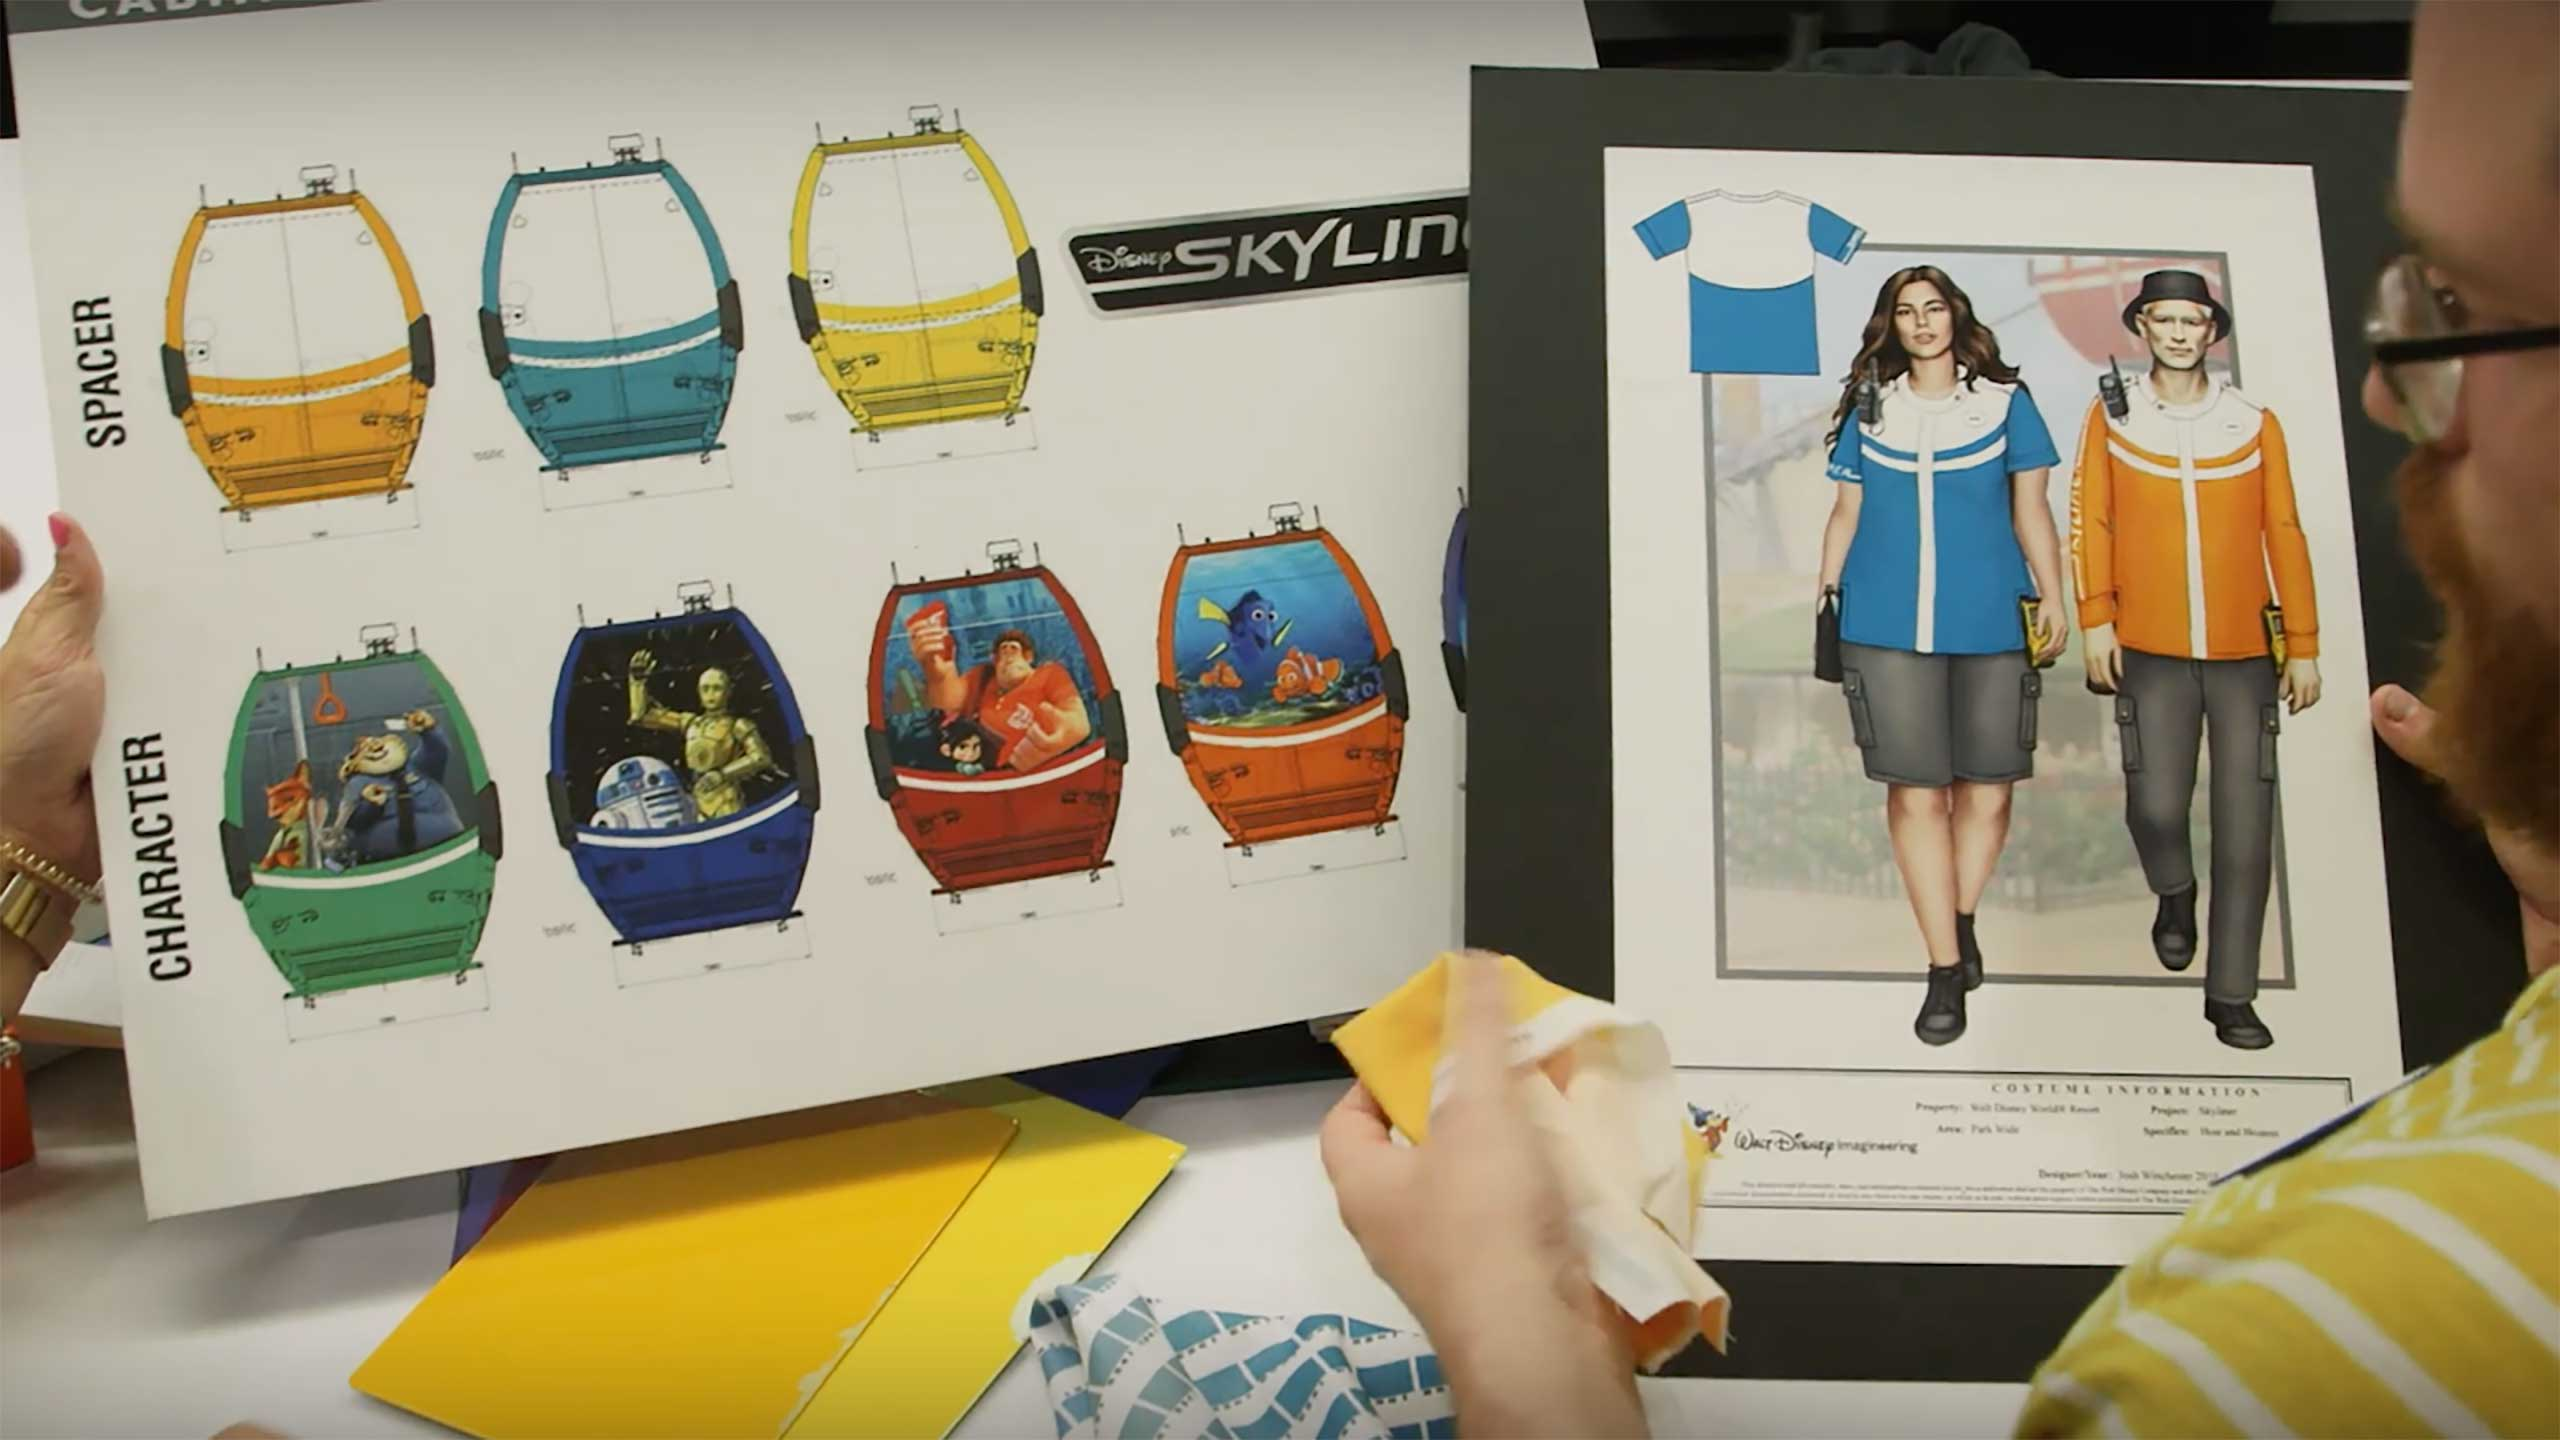 VIDEO - Creating the Disney Skyliner costumes